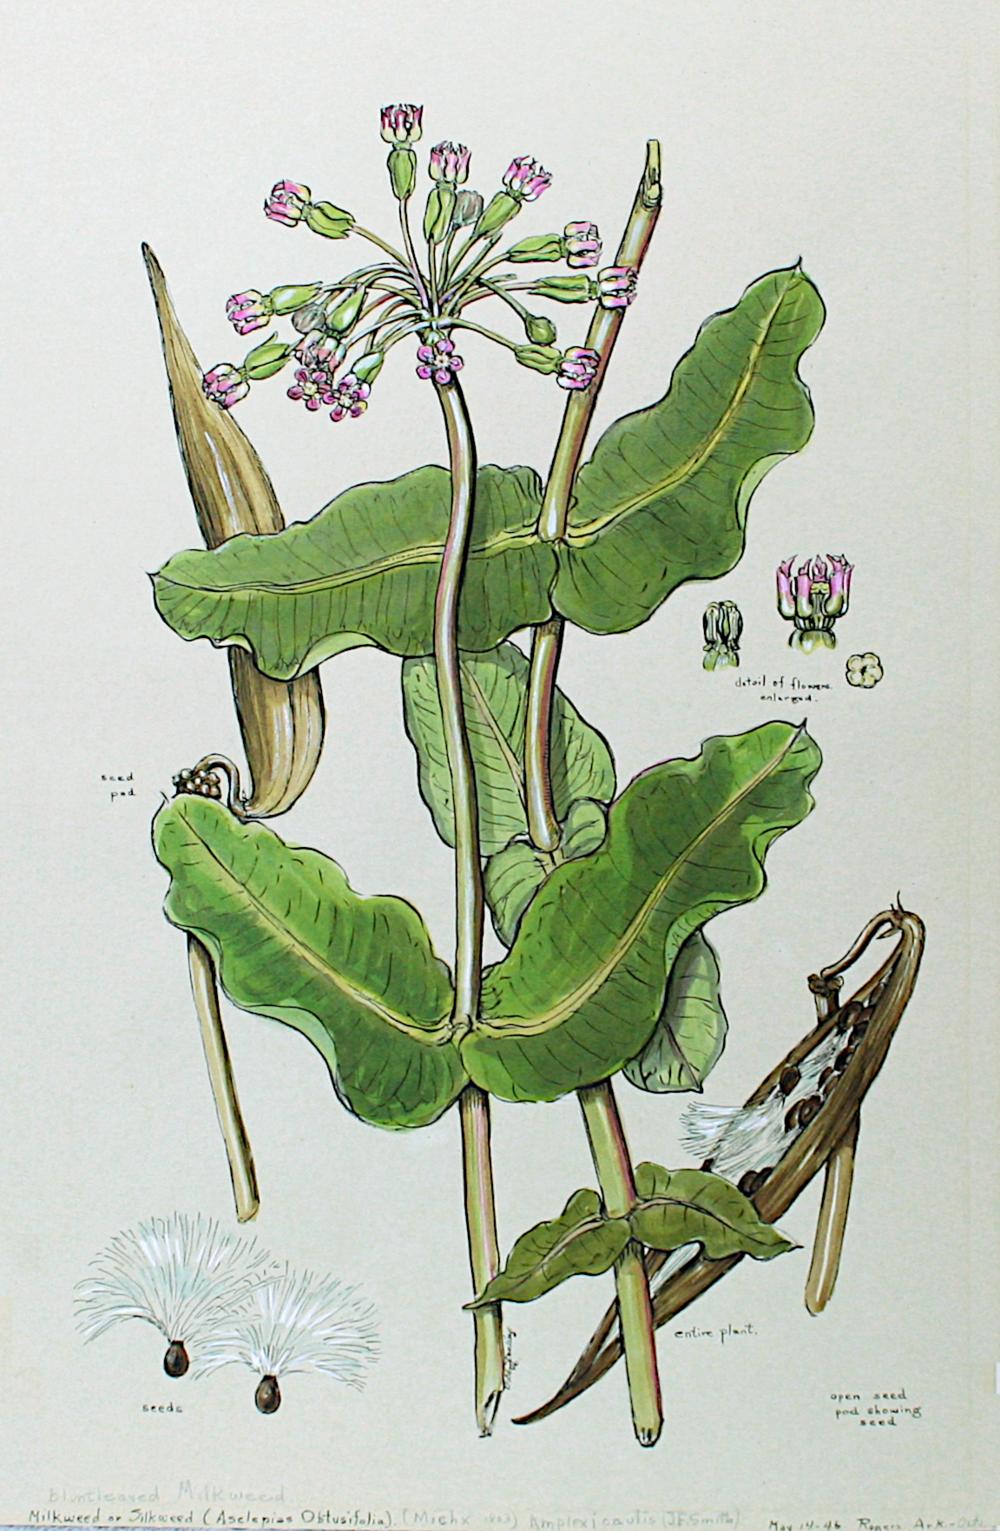 Blunt-Leaved Milkweed